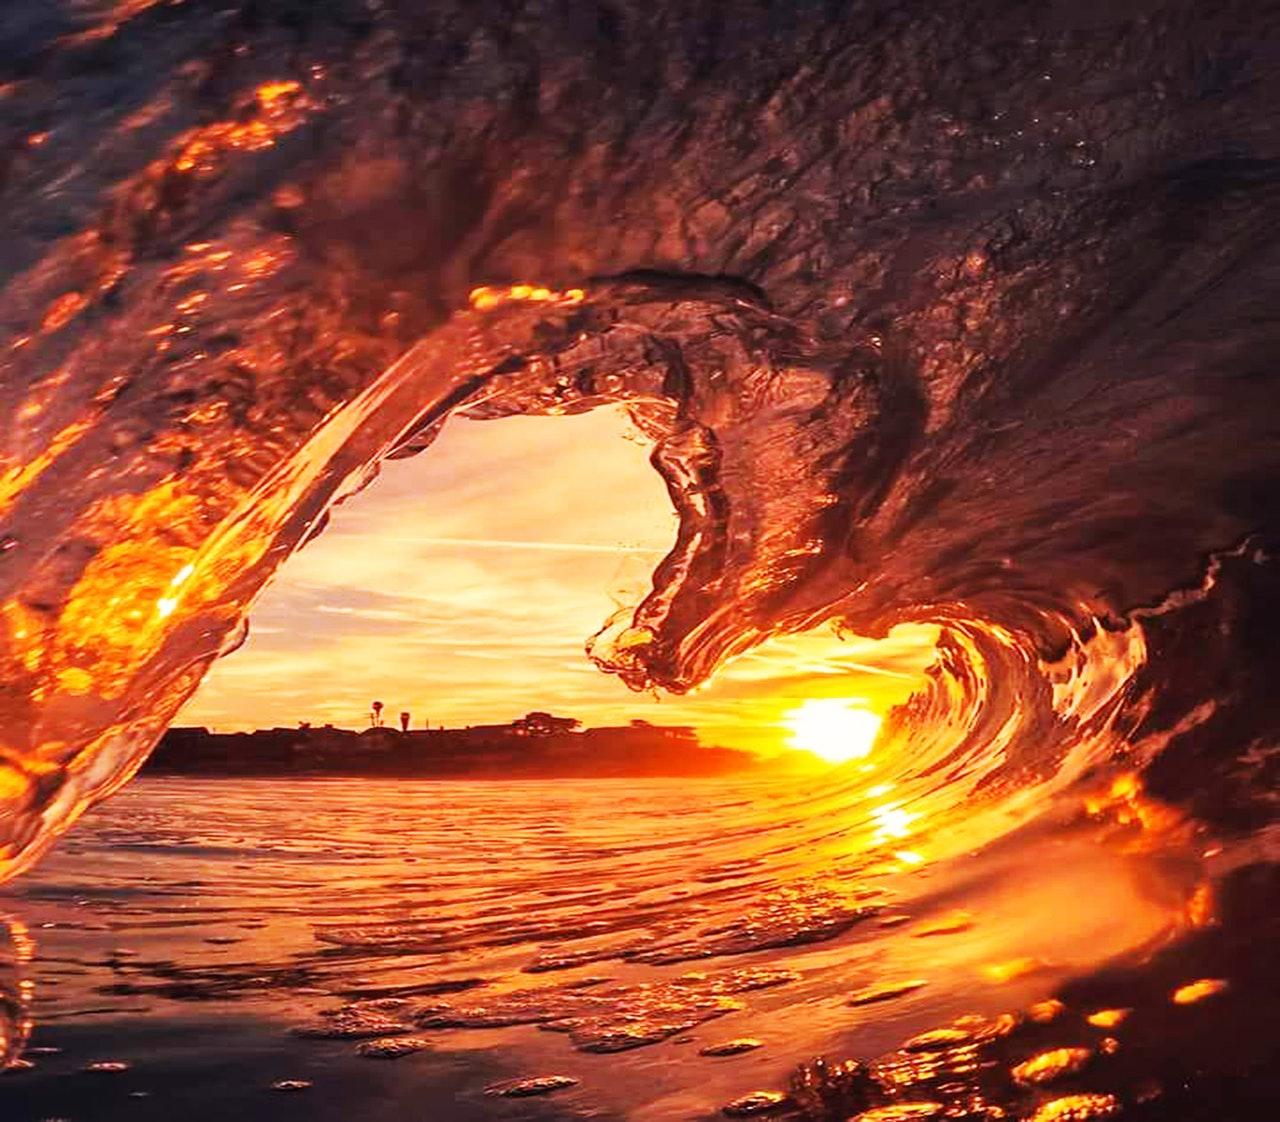 frozen wave against sunlight in the shape of a heart